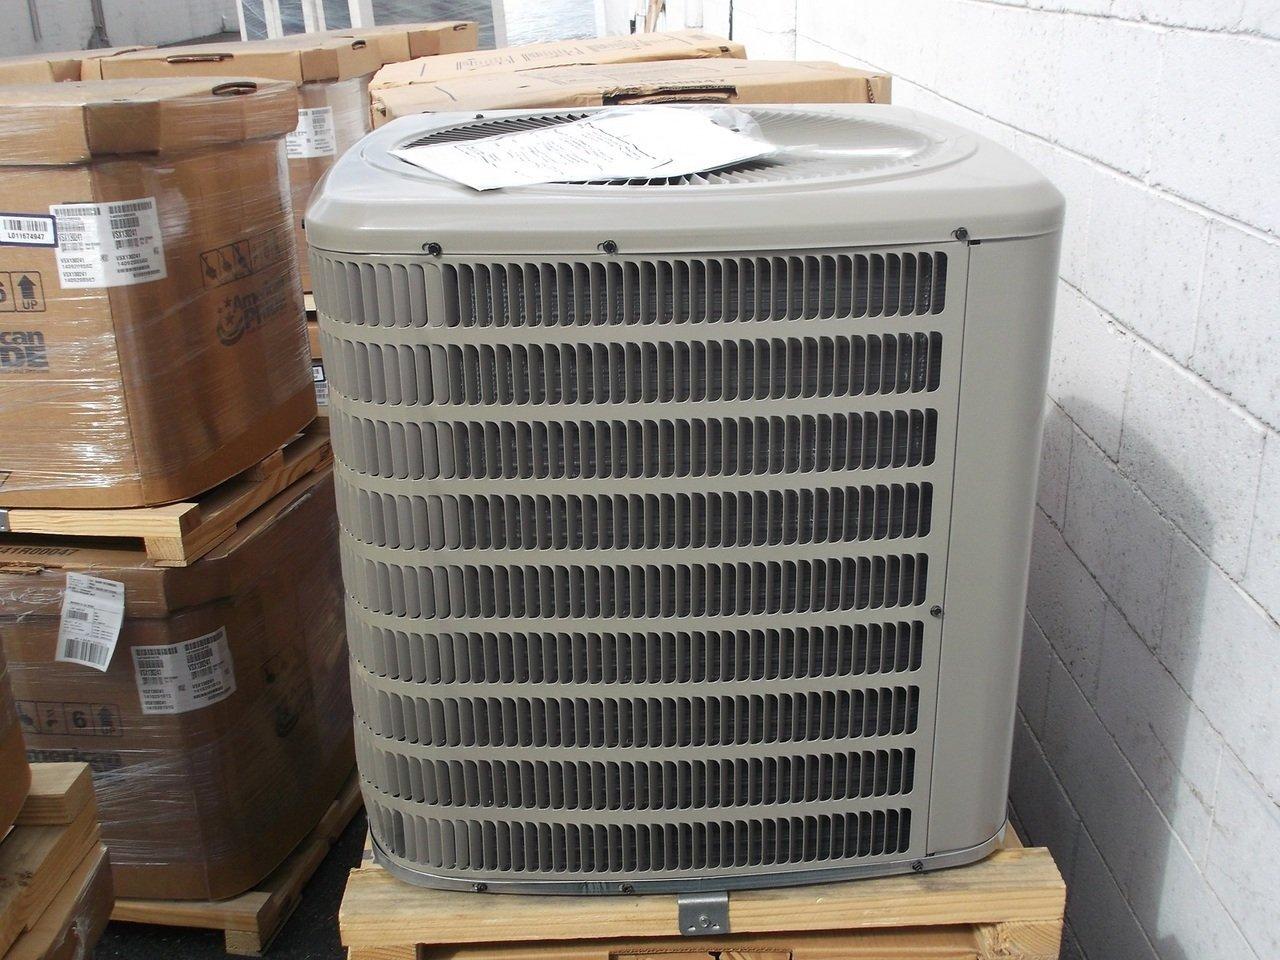 Buy Goodman Gmc Vsx130241 2 Ton 13 Seer Air Conditioner Condenser